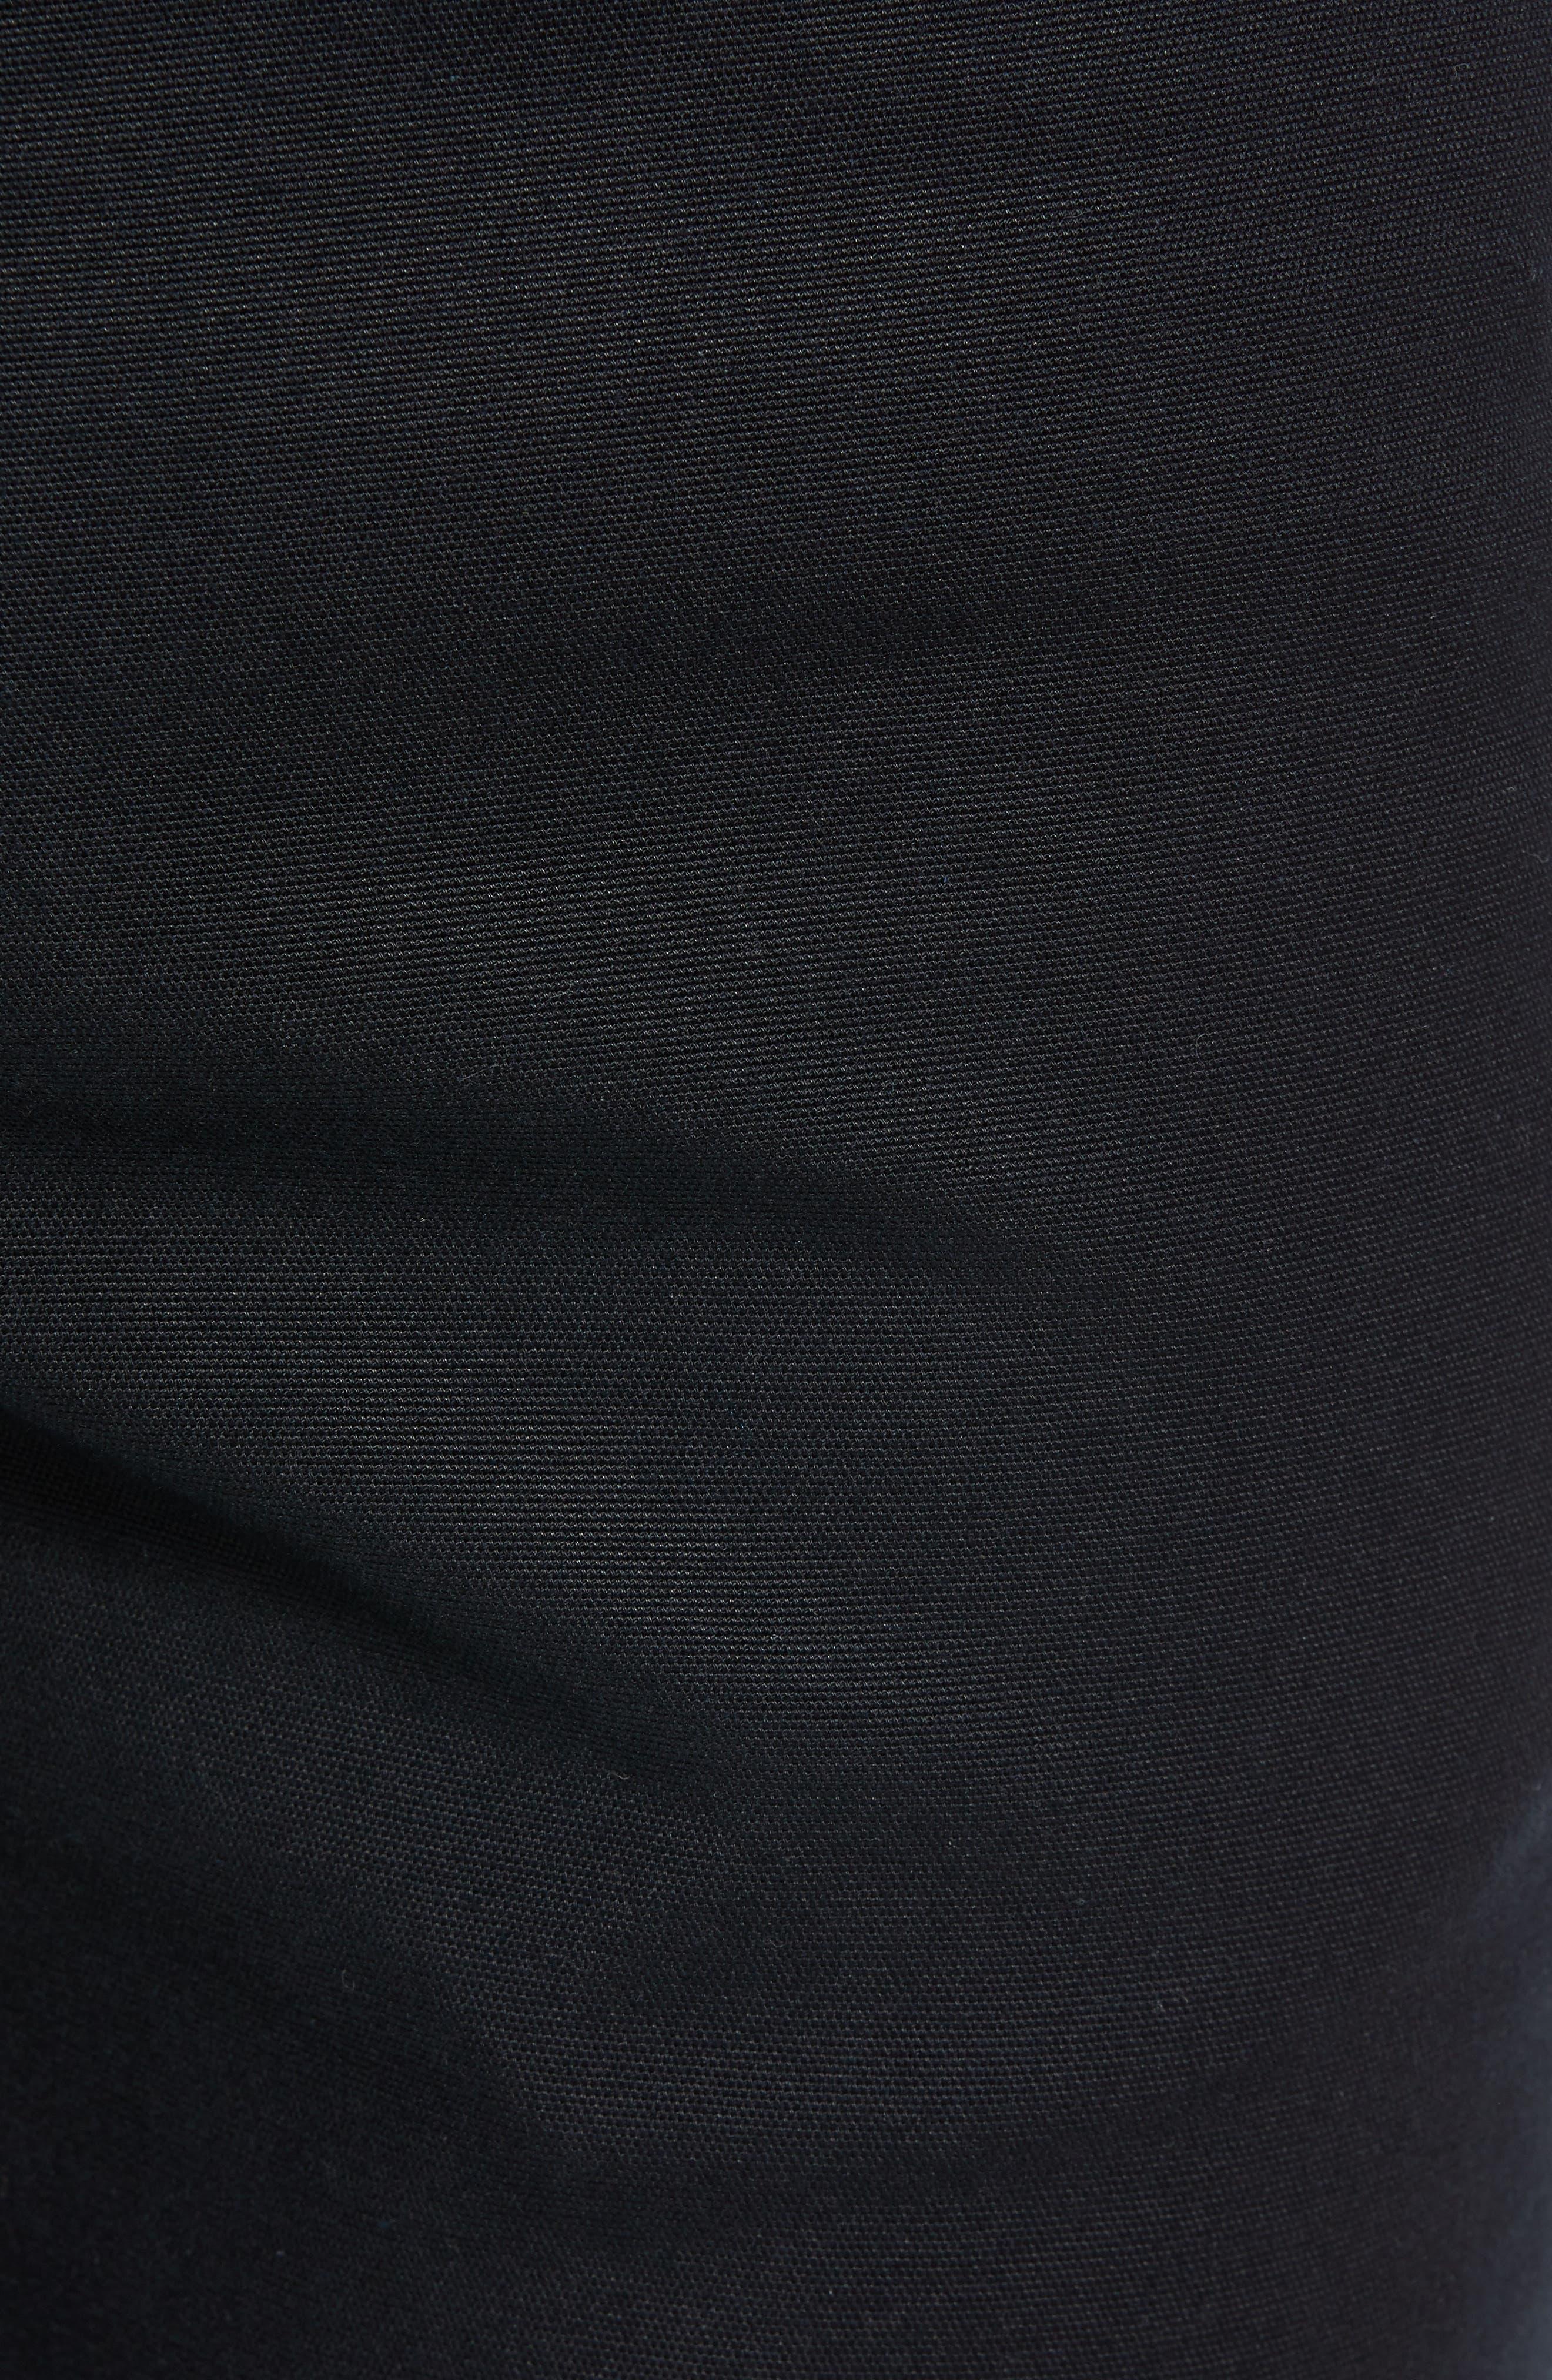 Key Isles Regular Fit Pants,                             Alternate thumbnail 5, color,                             BLACK